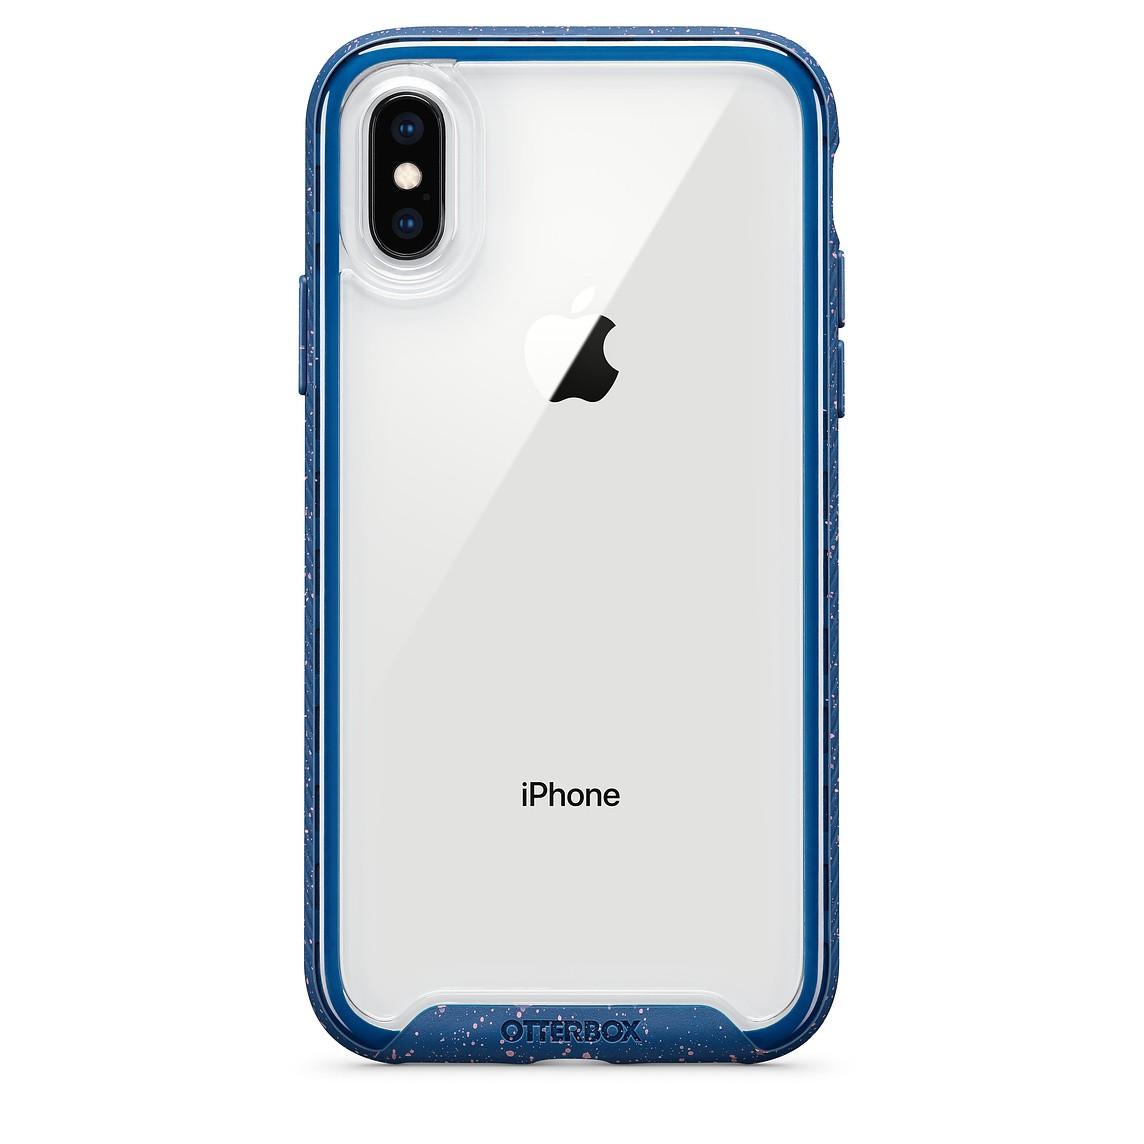 Capa OtterBox Mod Traction Para iPhone X/XS Azul Marinho